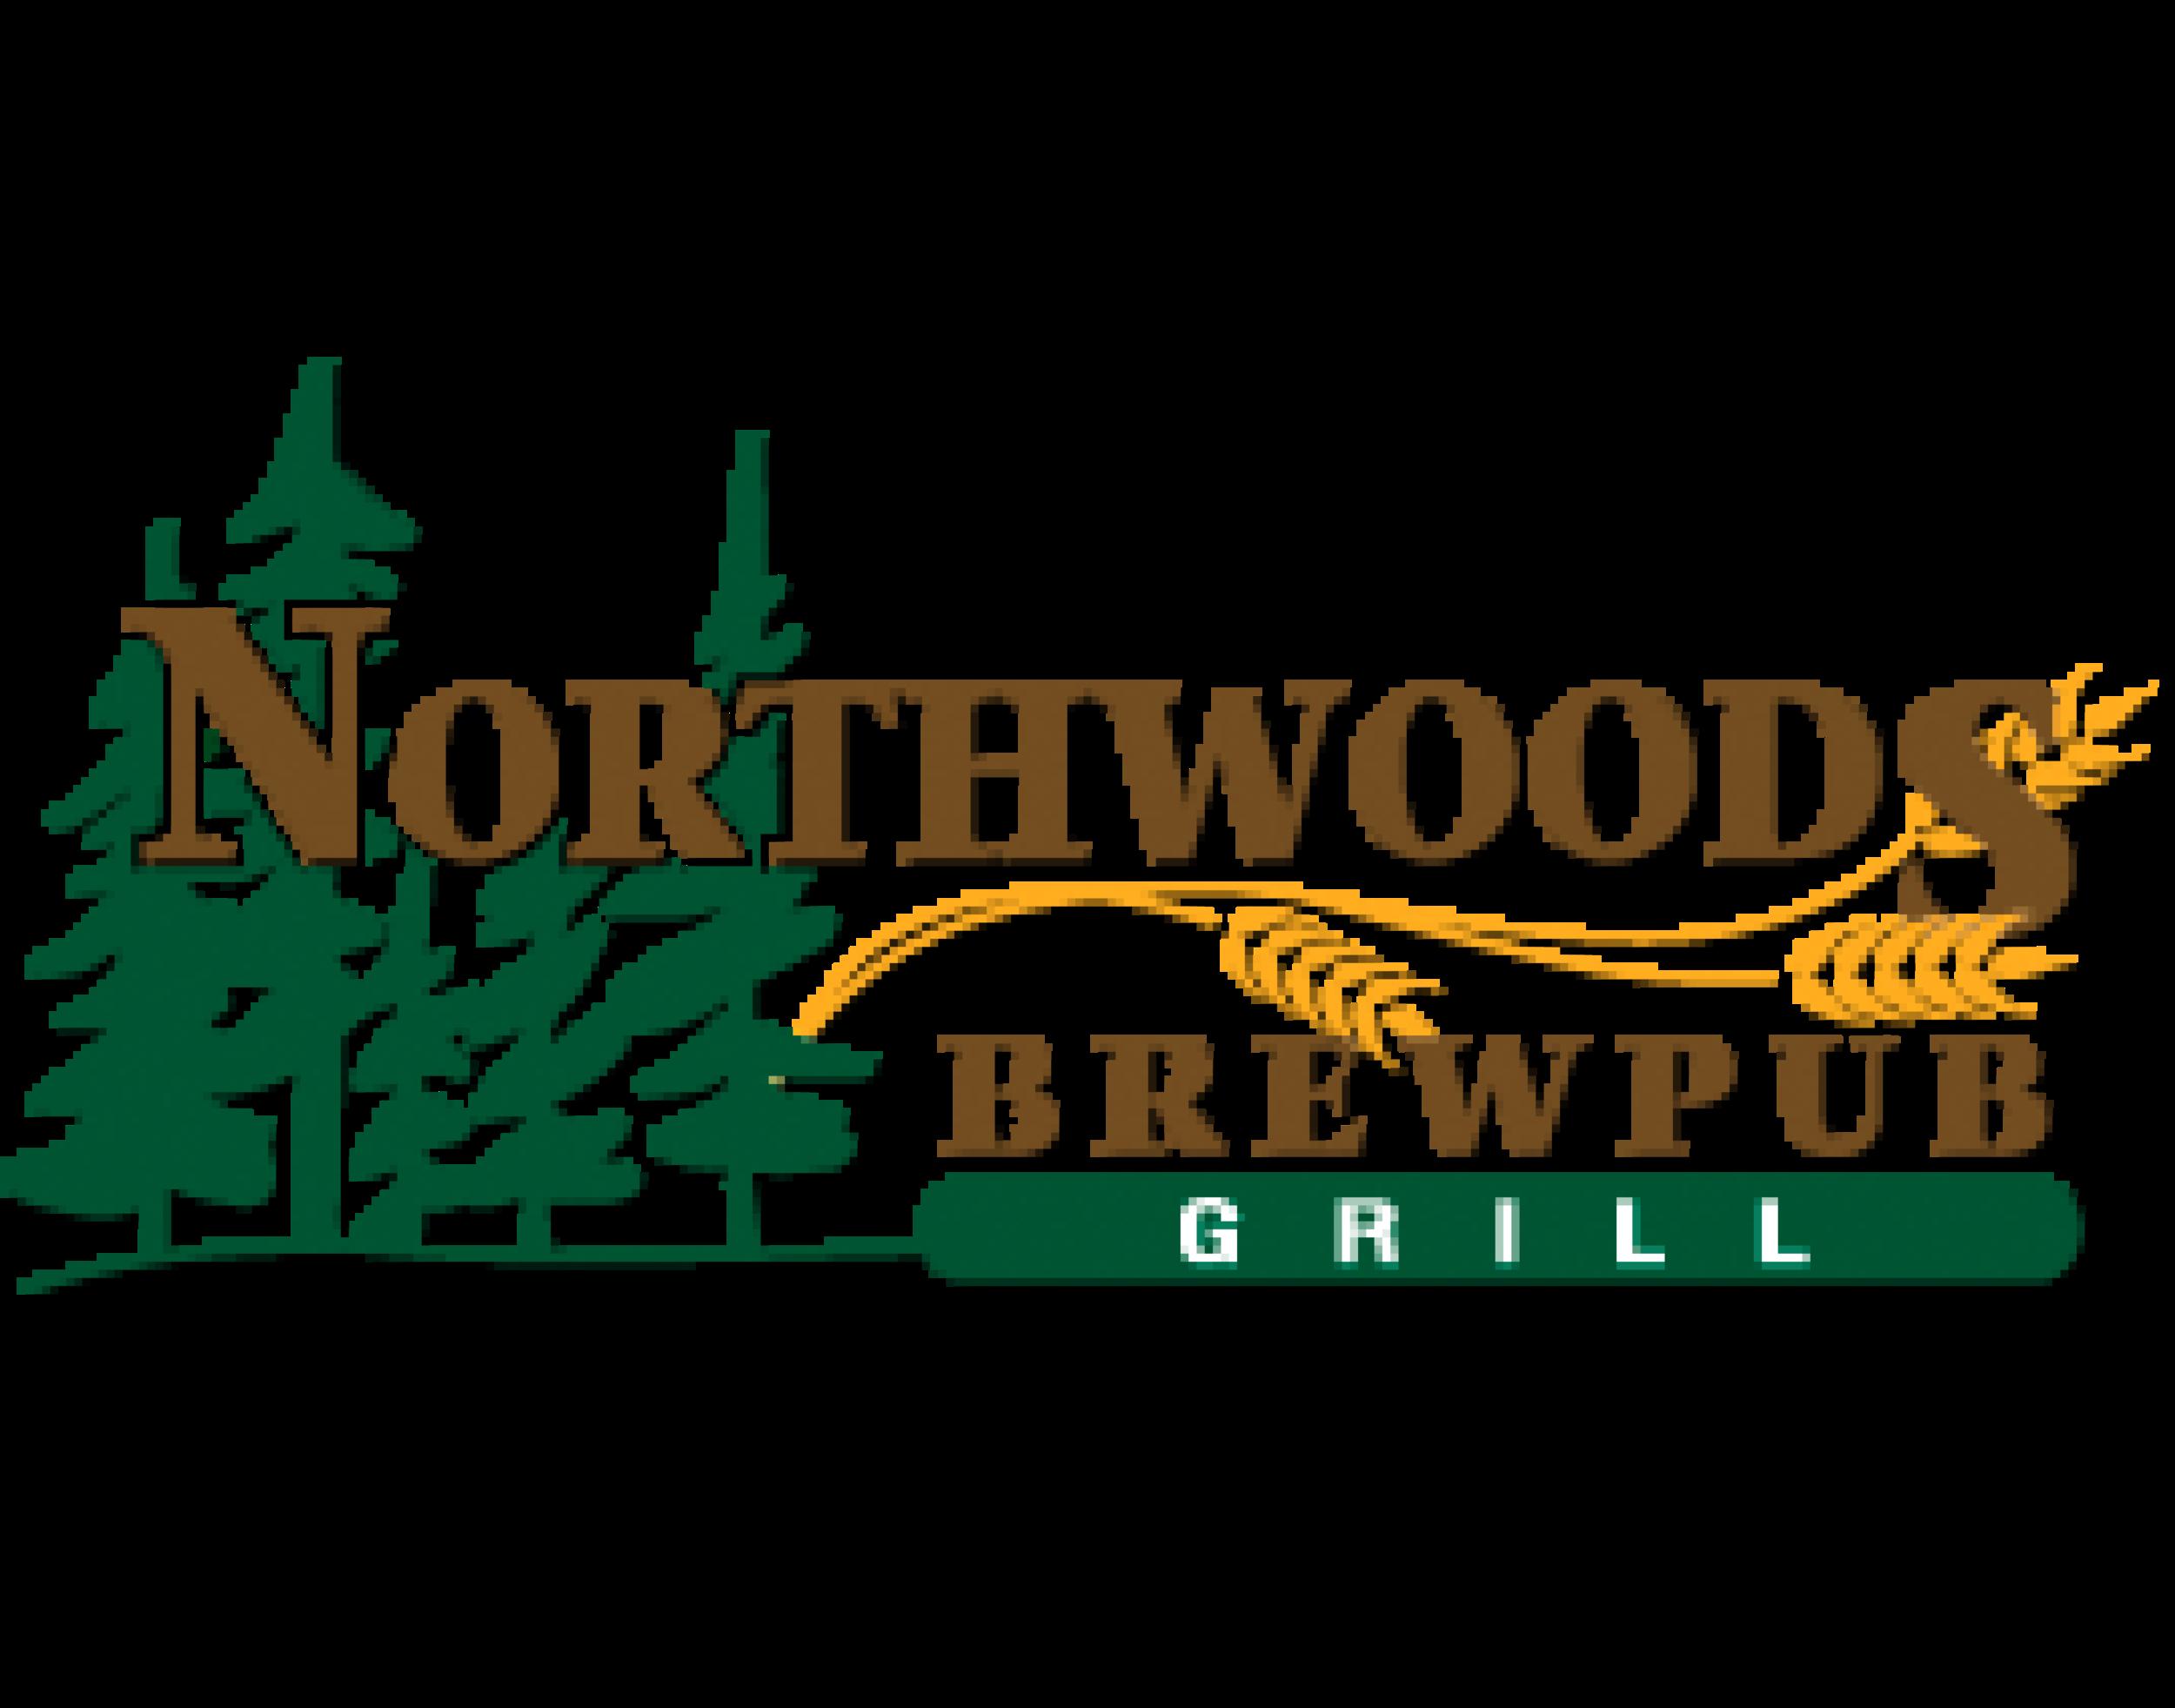 Northwoods Brewpub logo. Links to Northwoods Brewpub website.